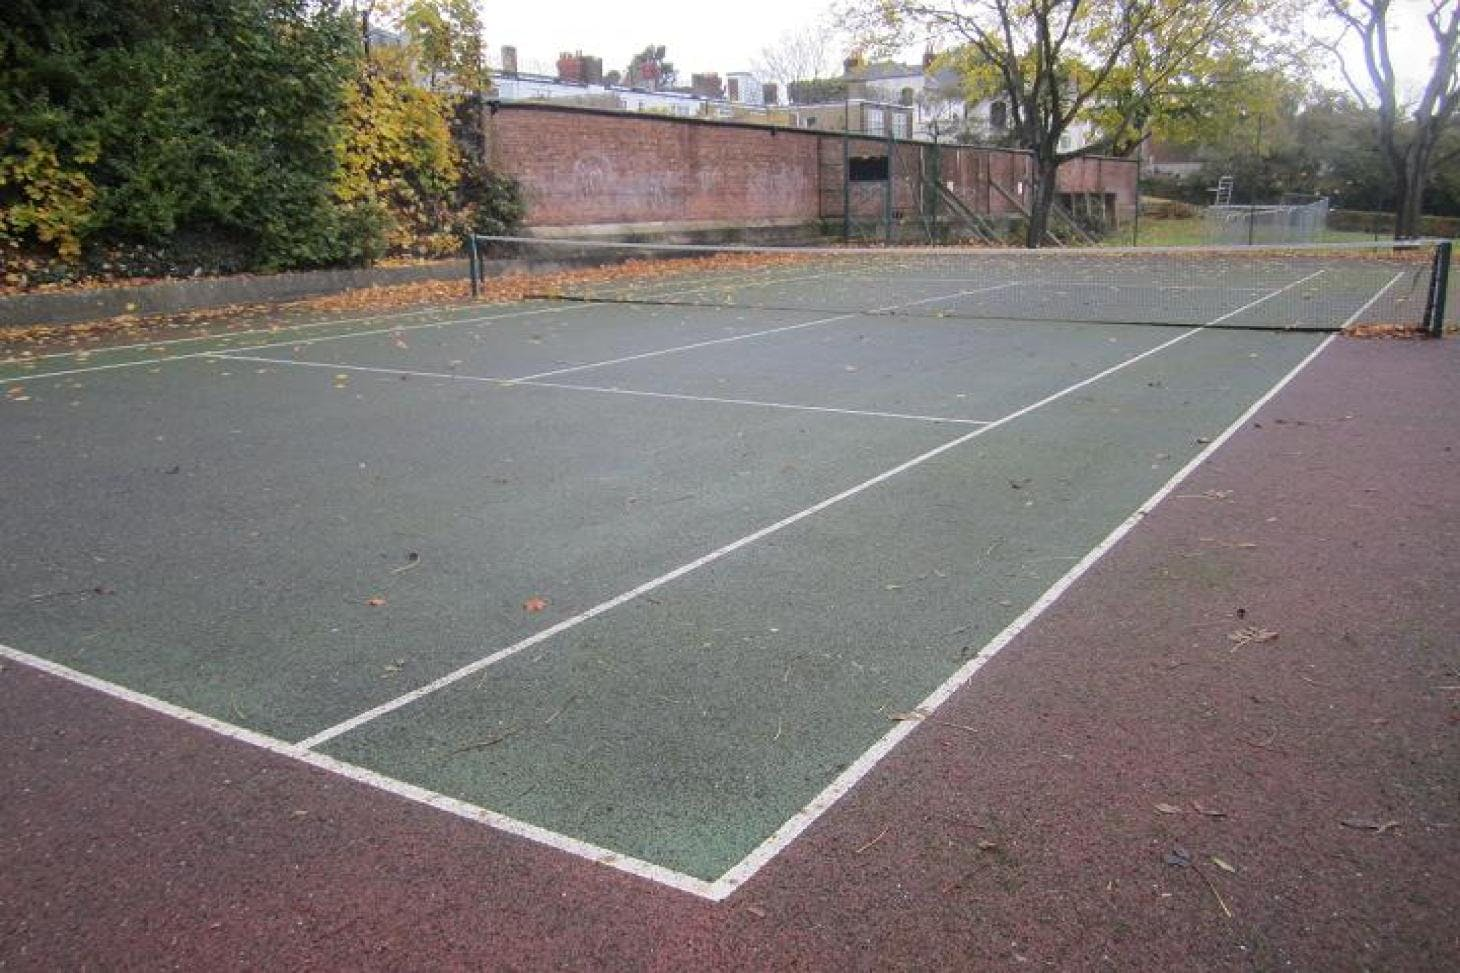 Hillside Gardens Outdoor | Hard (macadam) tennis court